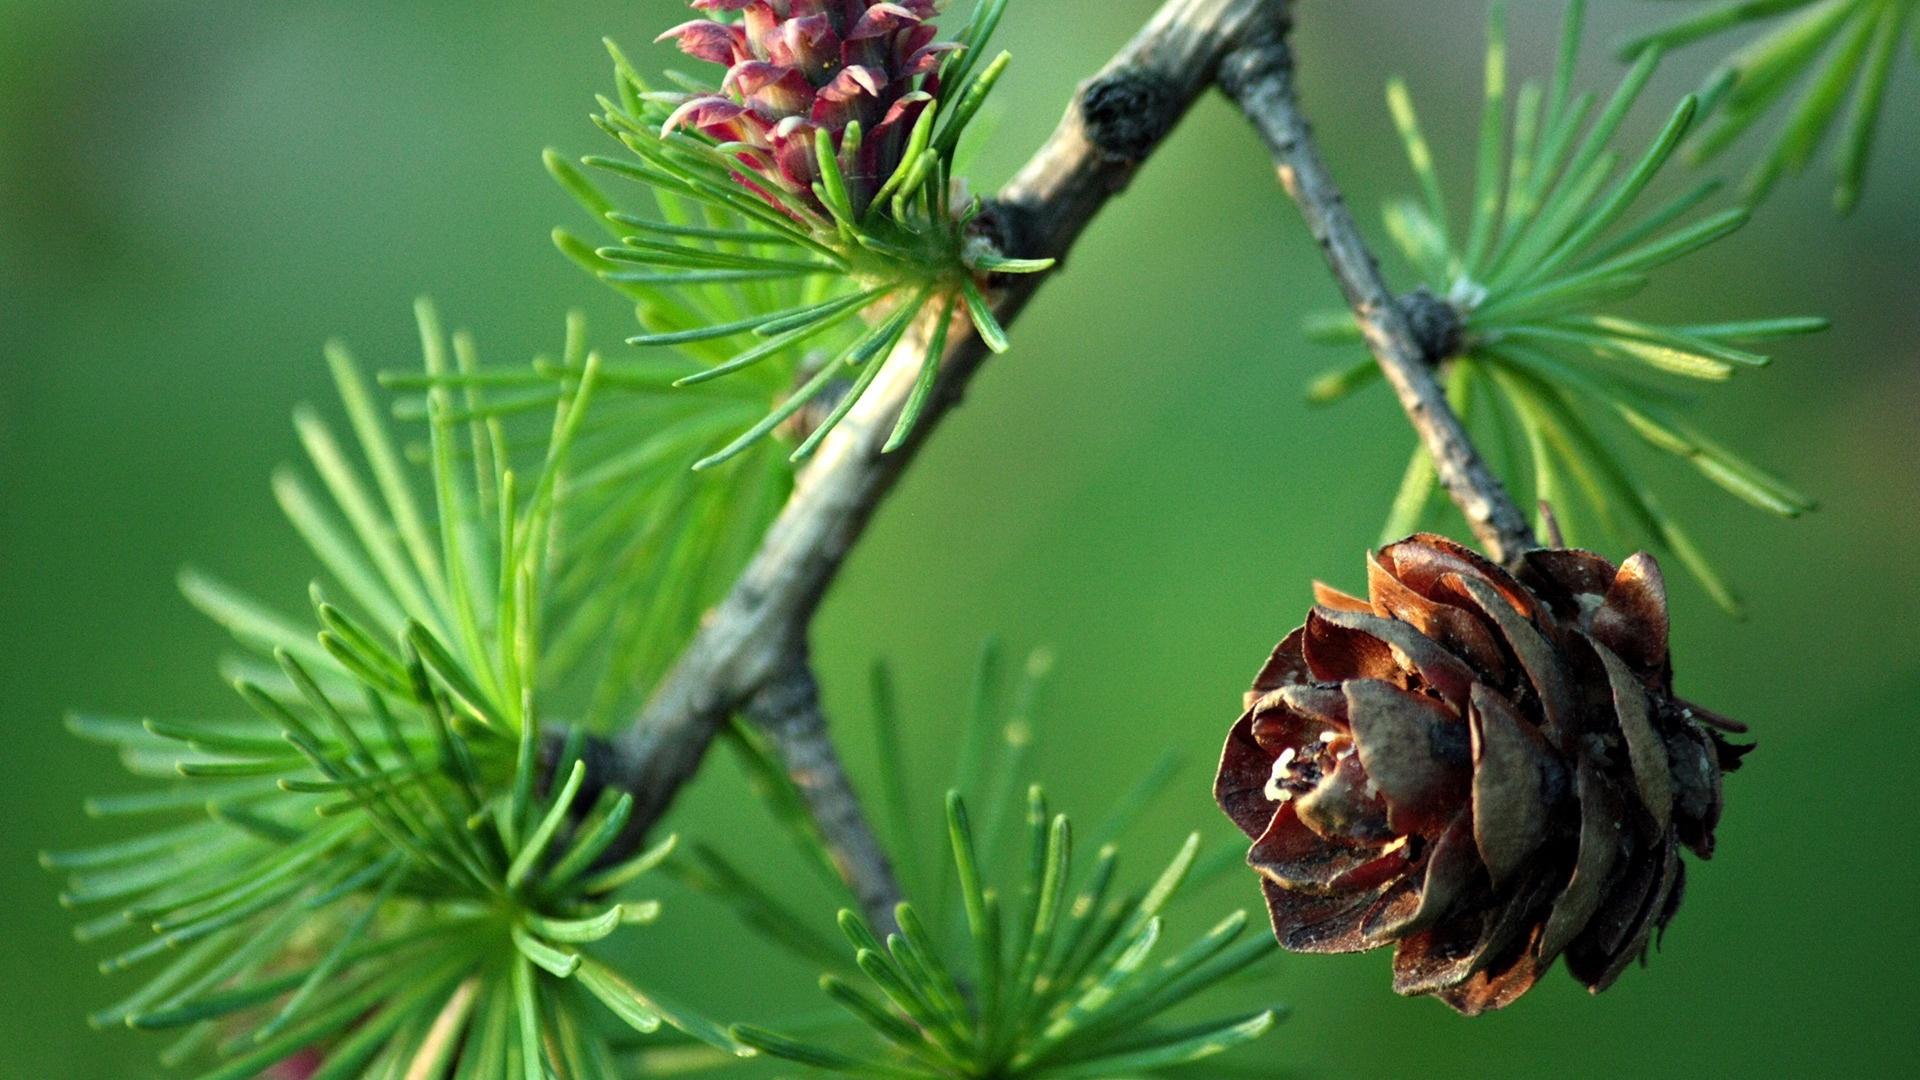 Pine Cone wallpaper for desktop